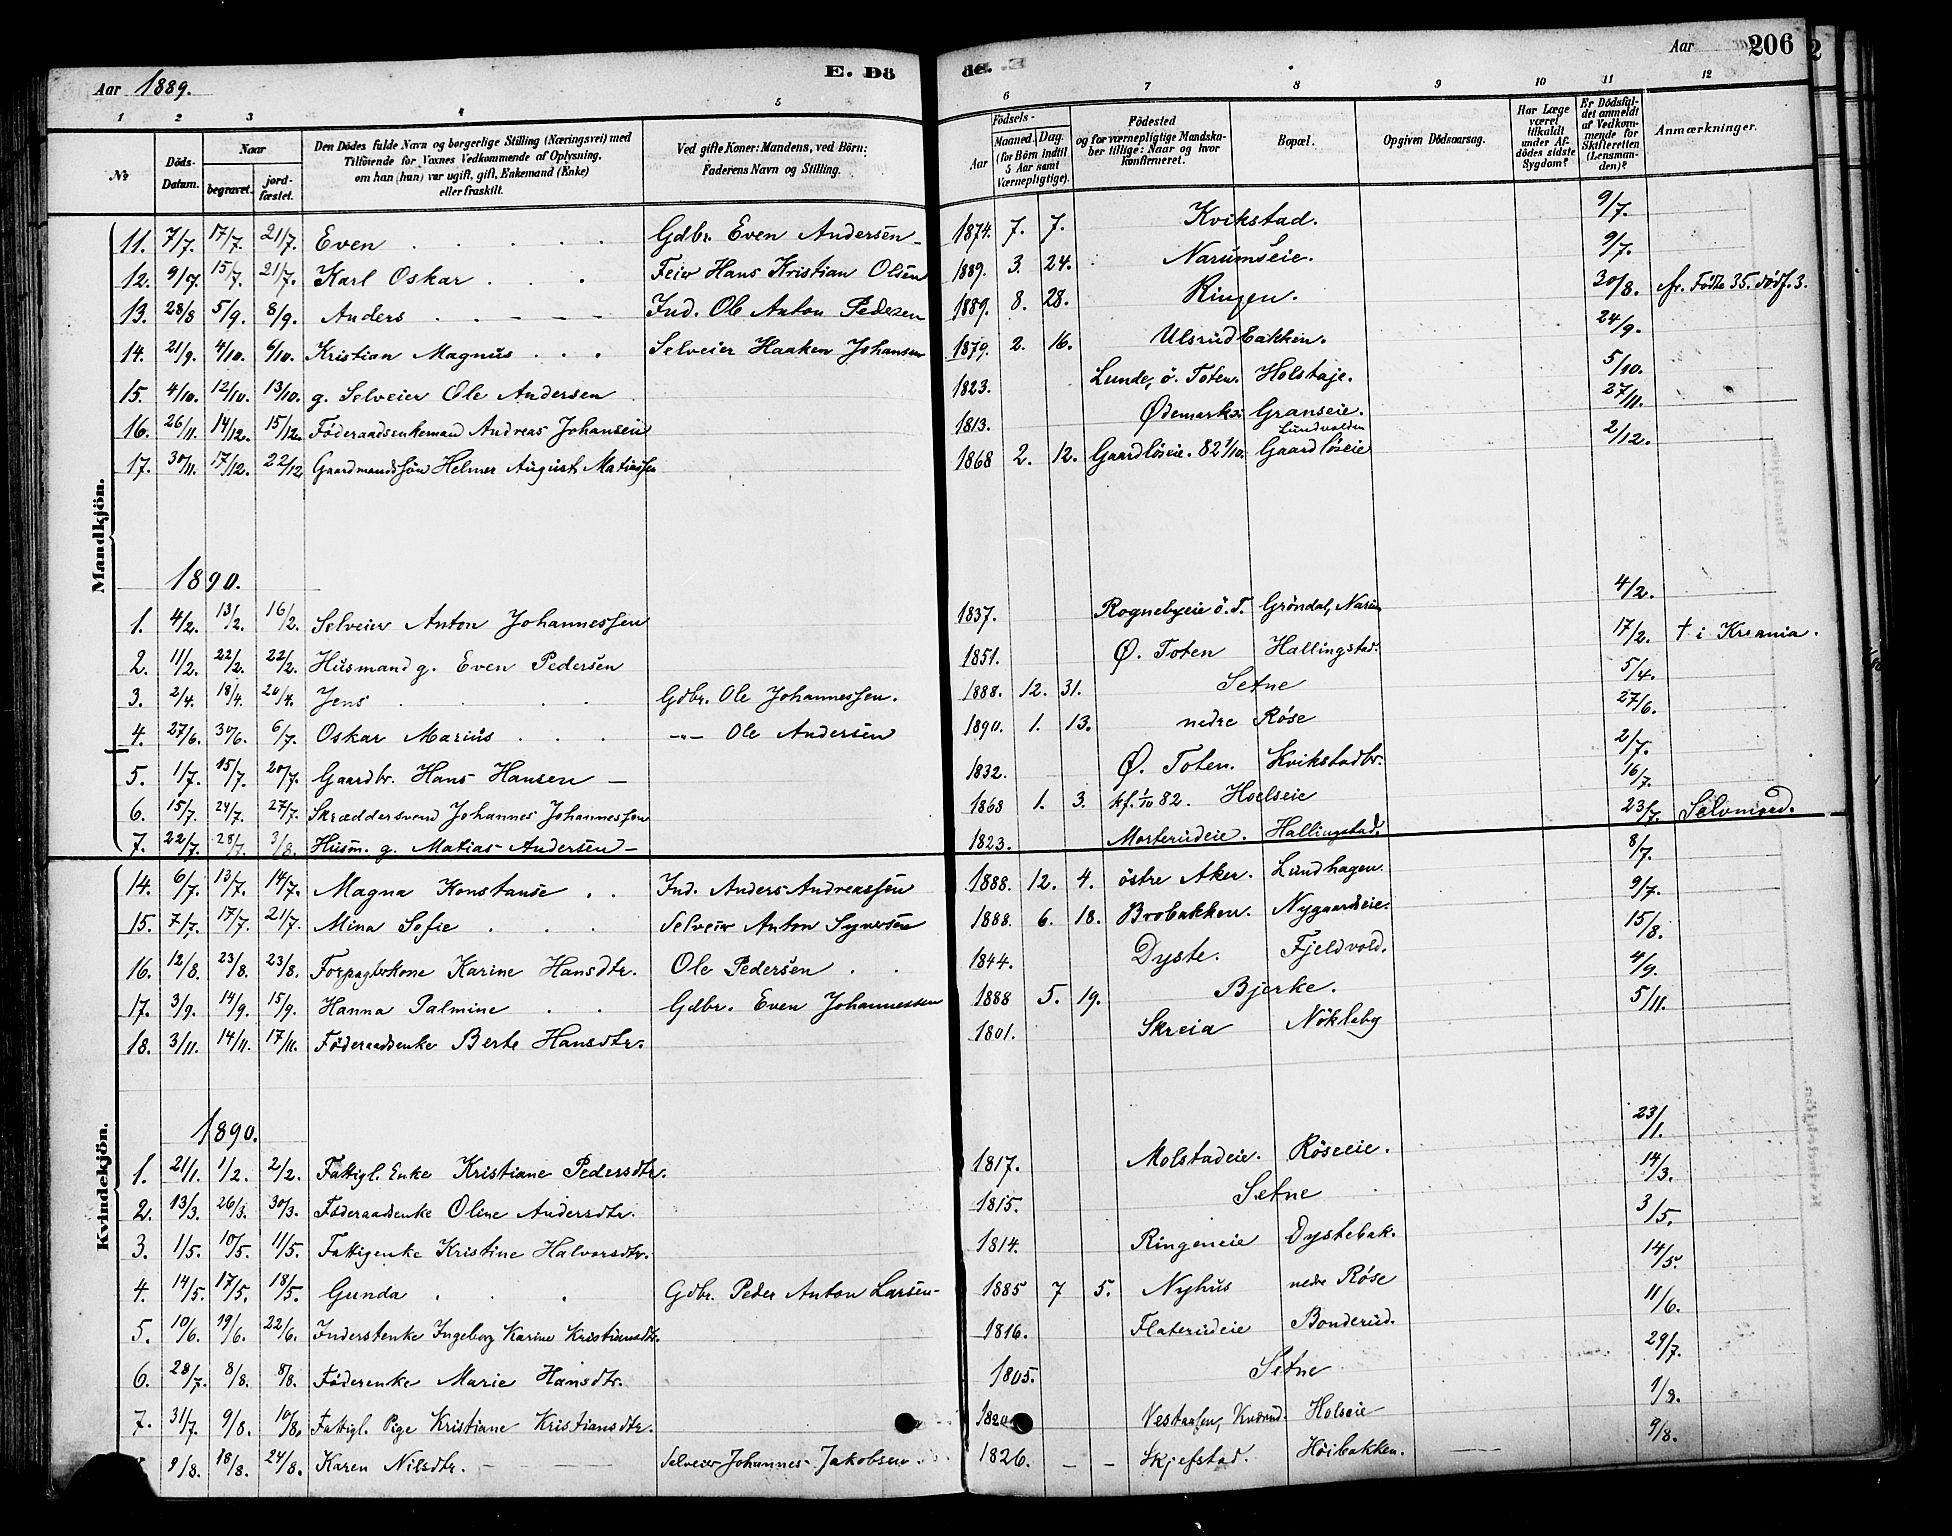 SAH, Vestre Toten prestekontor, H/Ha/Haa/L0010: Ministerialbok nr. 10, 1878-1894, s. 206